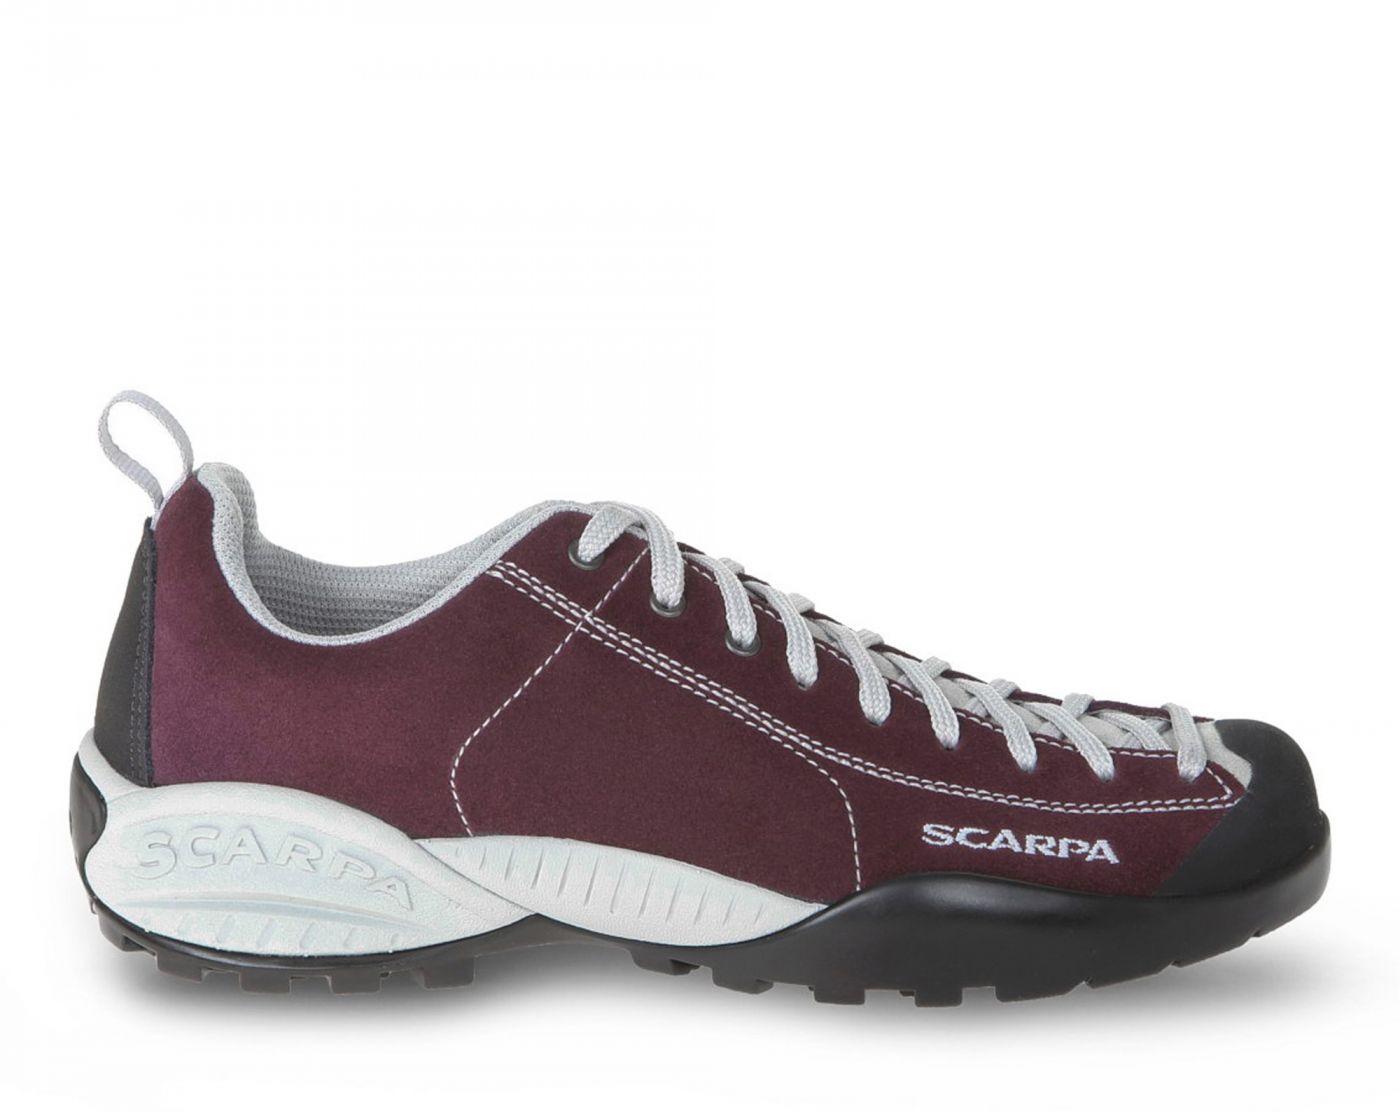 Shoes Lifestyle women/'s SCARPA Mojito color Lagoon